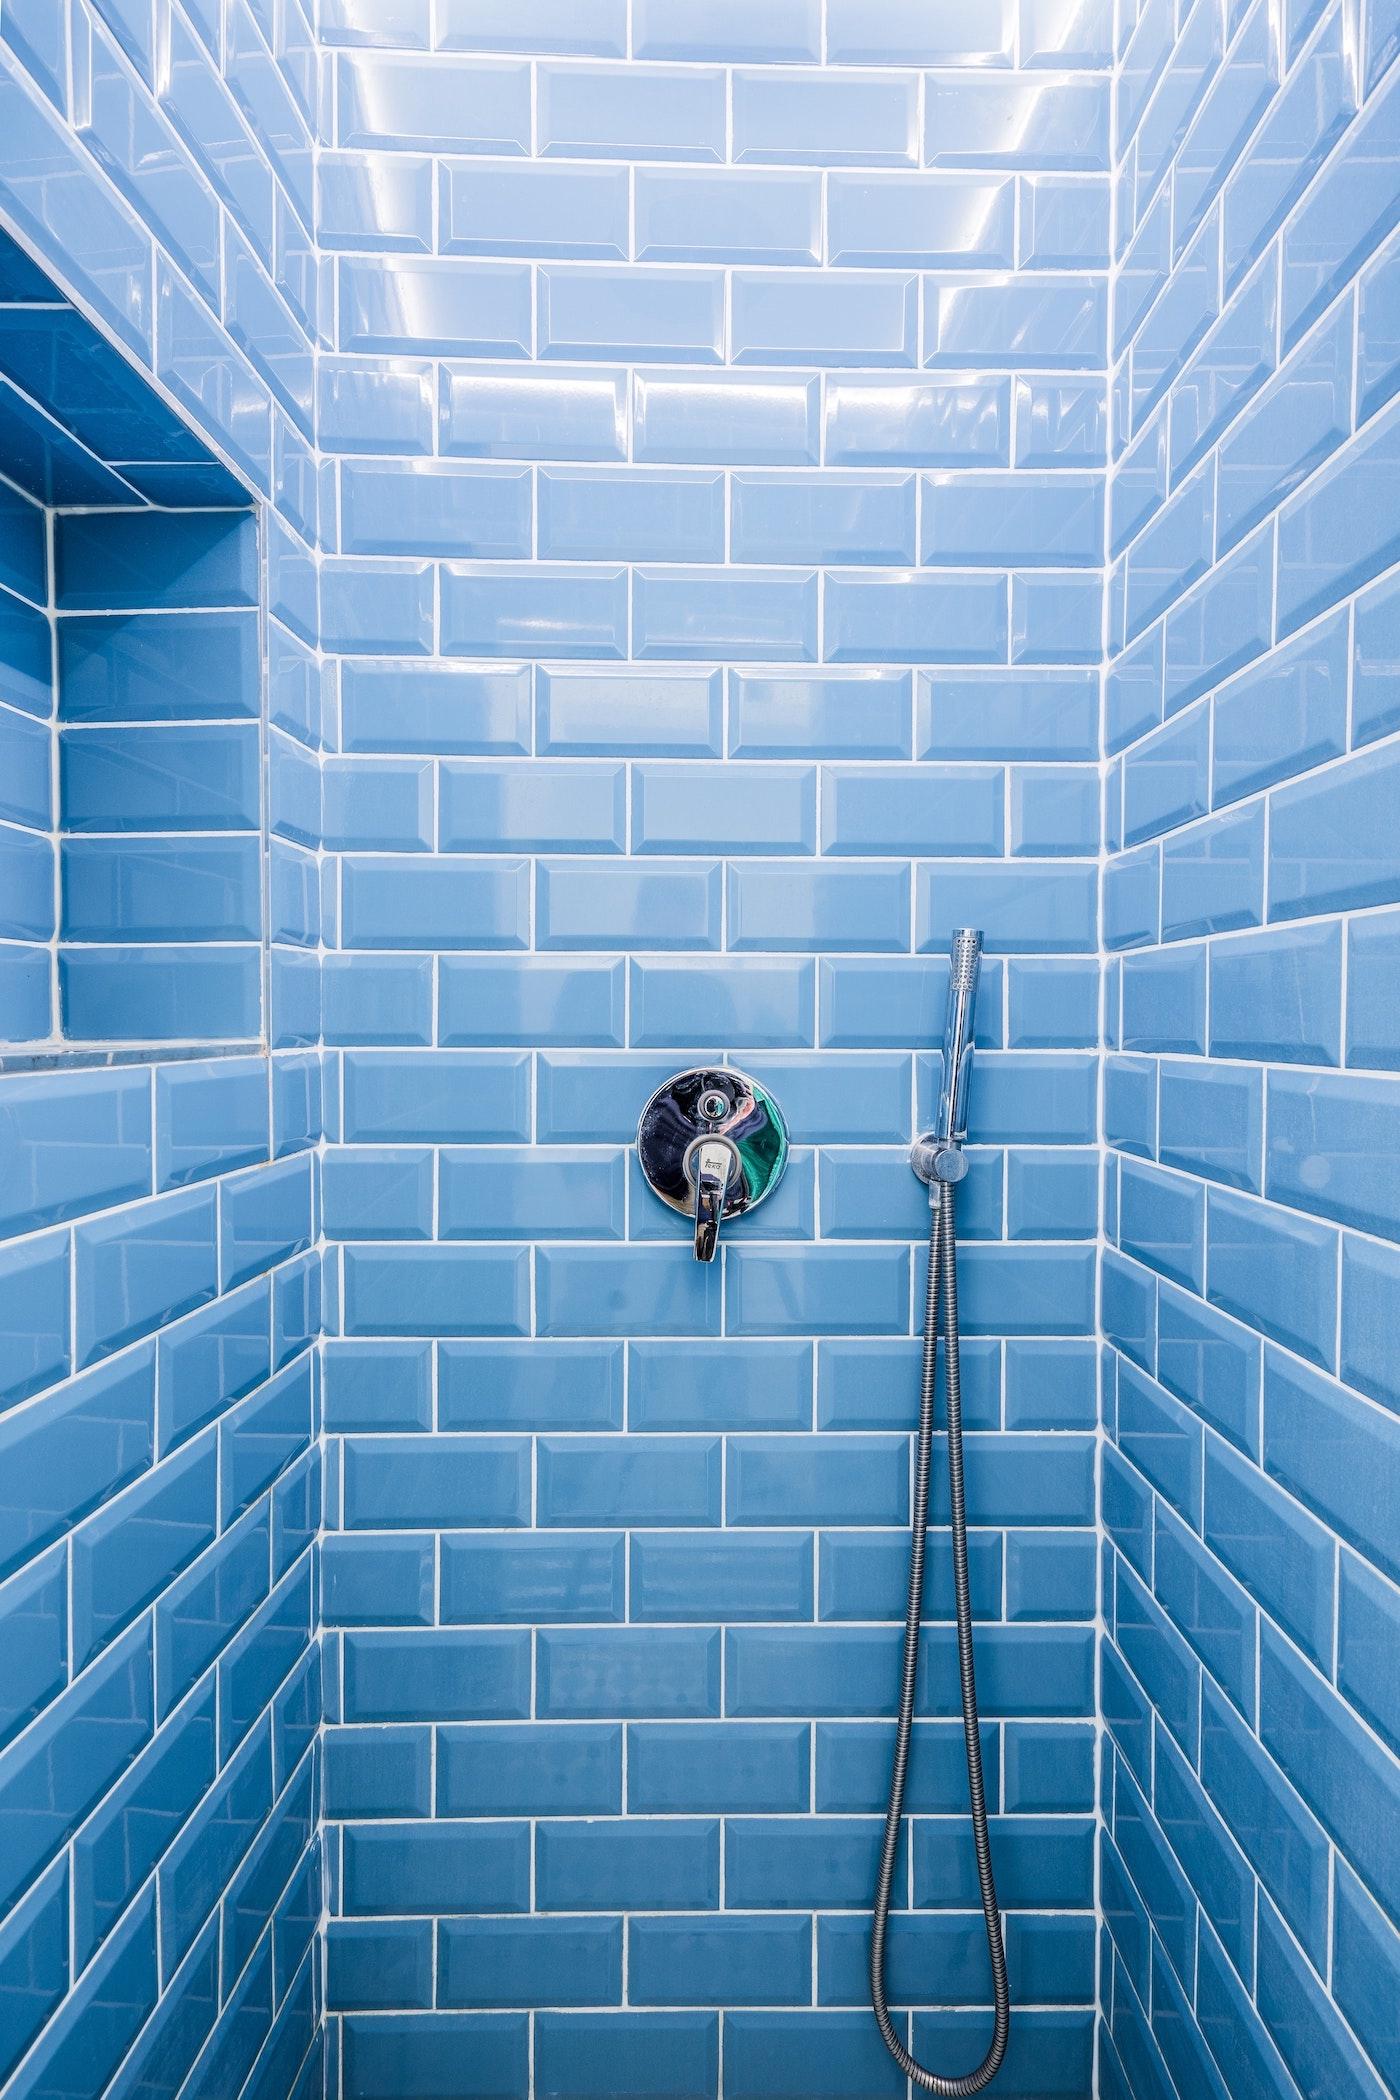 Blue tiles in the shower